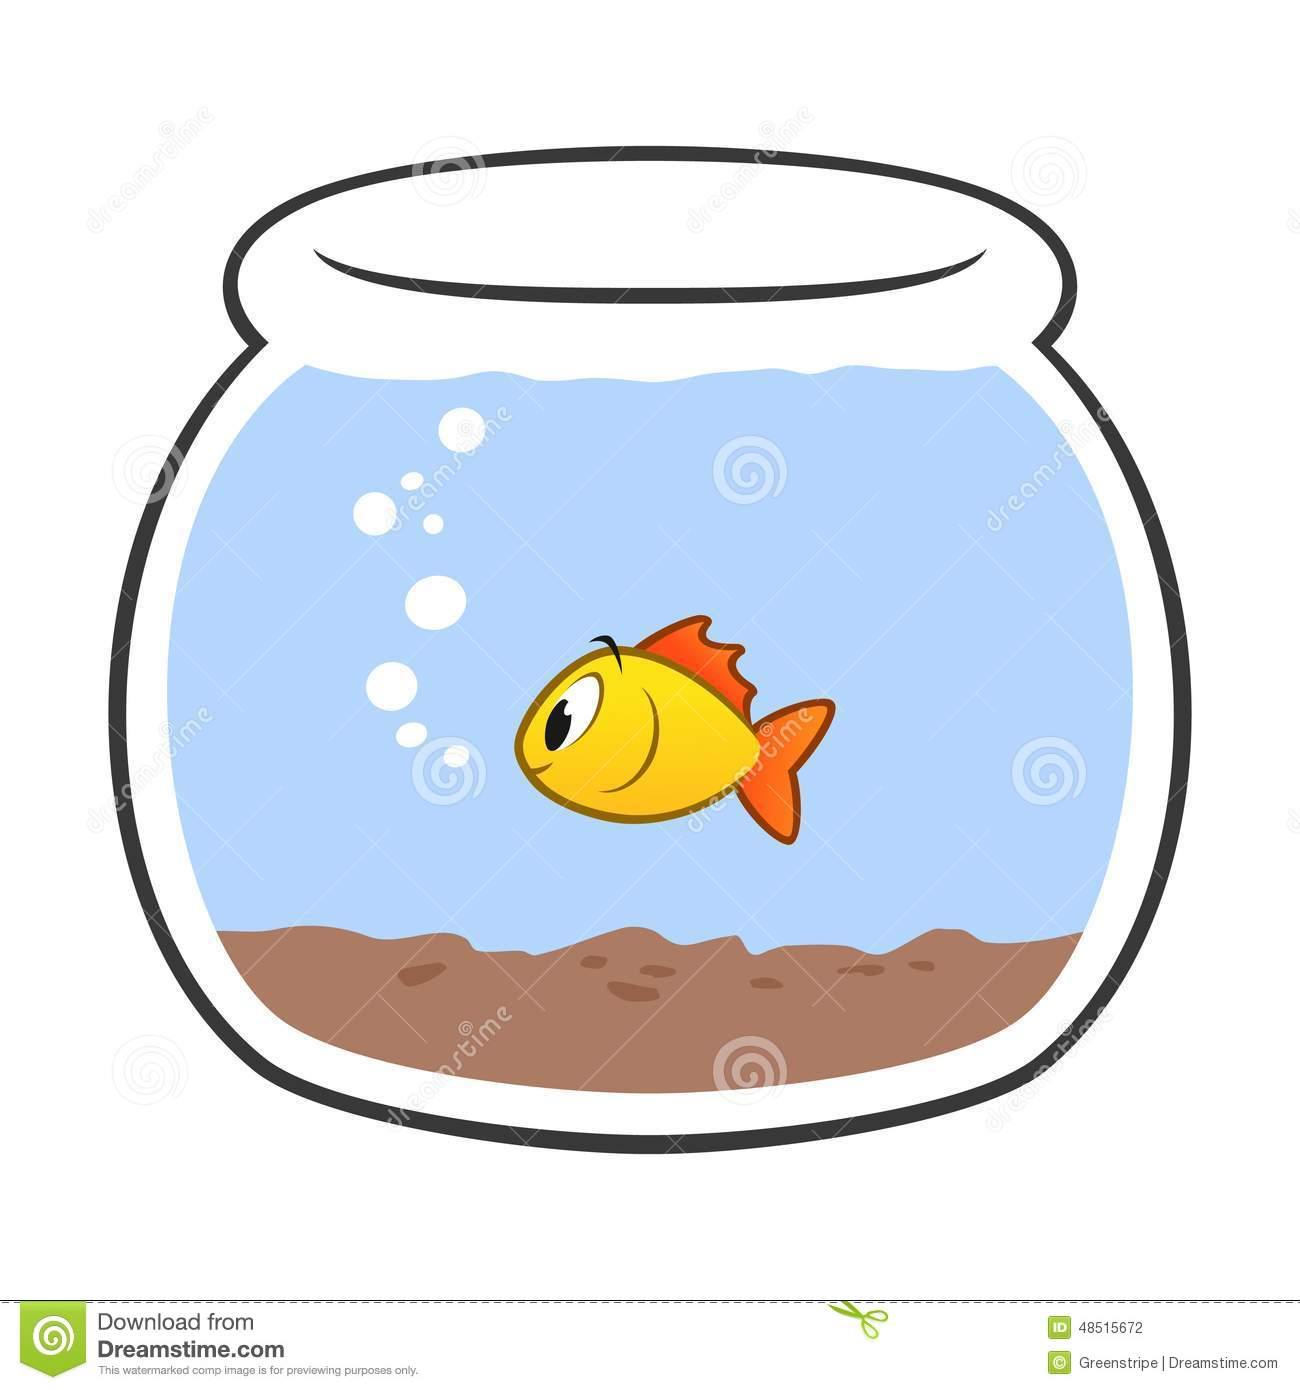 Goldfish clipart goldfish tank, Goldfish goldfish tank.